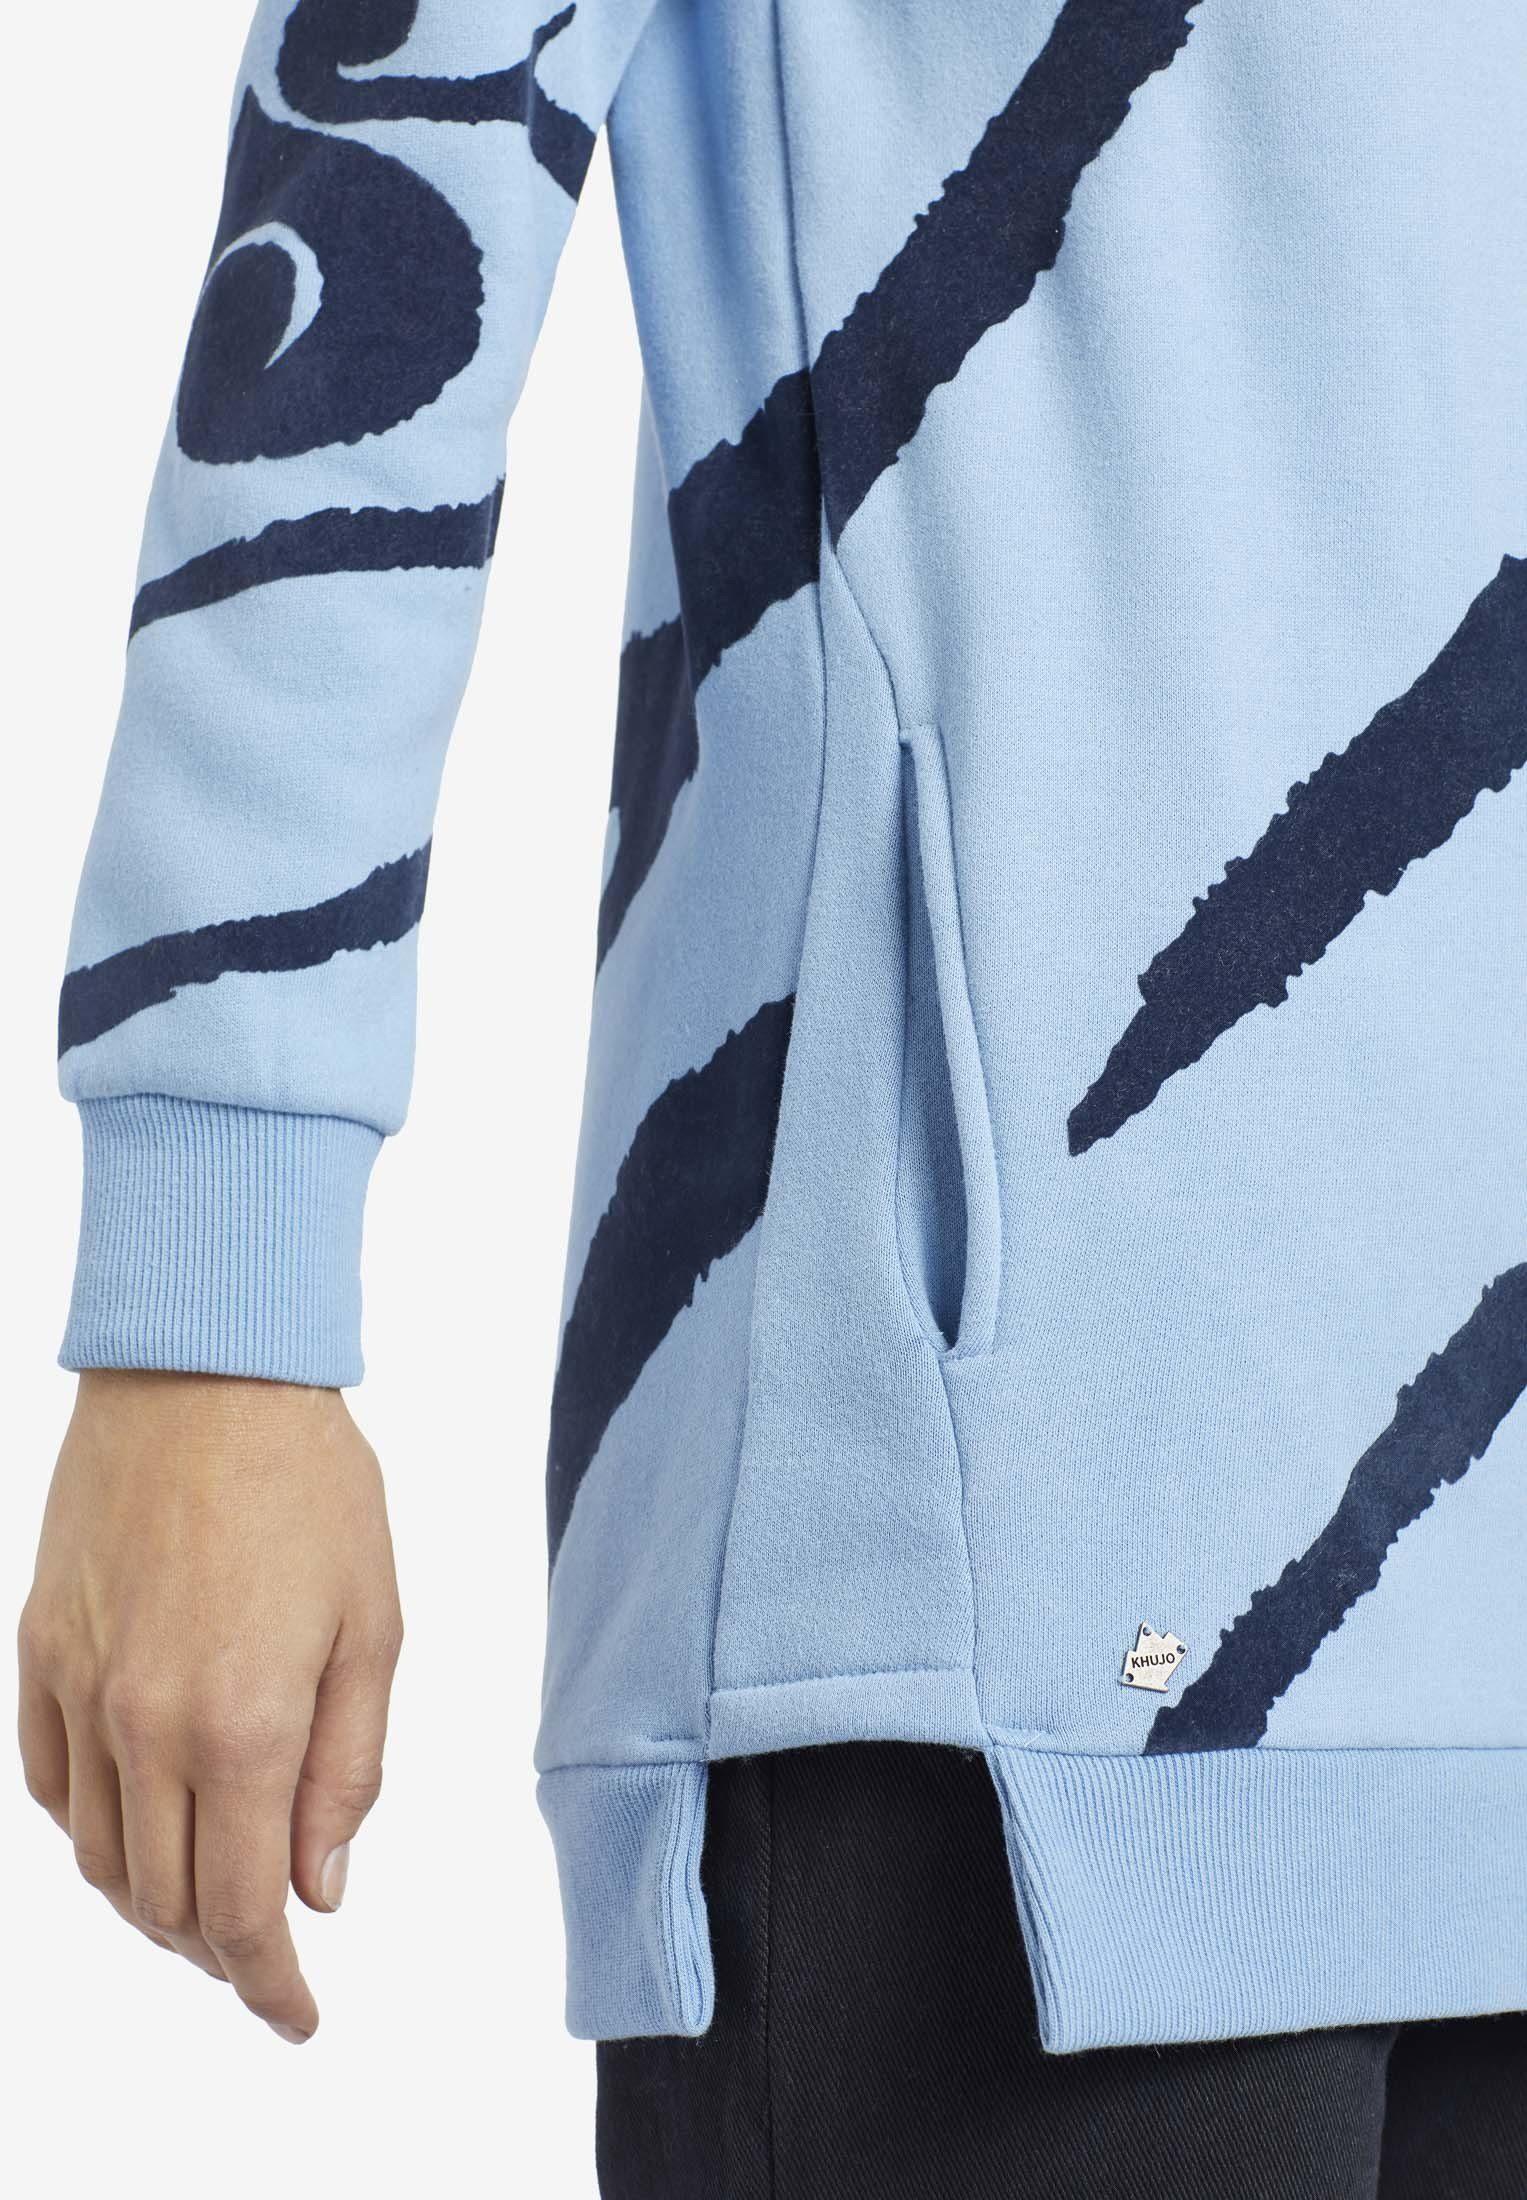 »malisa« Flockdruck Khujo Longsweatshirt Flockdruck Longsweatshirt »malisa« Mit Khujo Mit uTlkwZXOPi